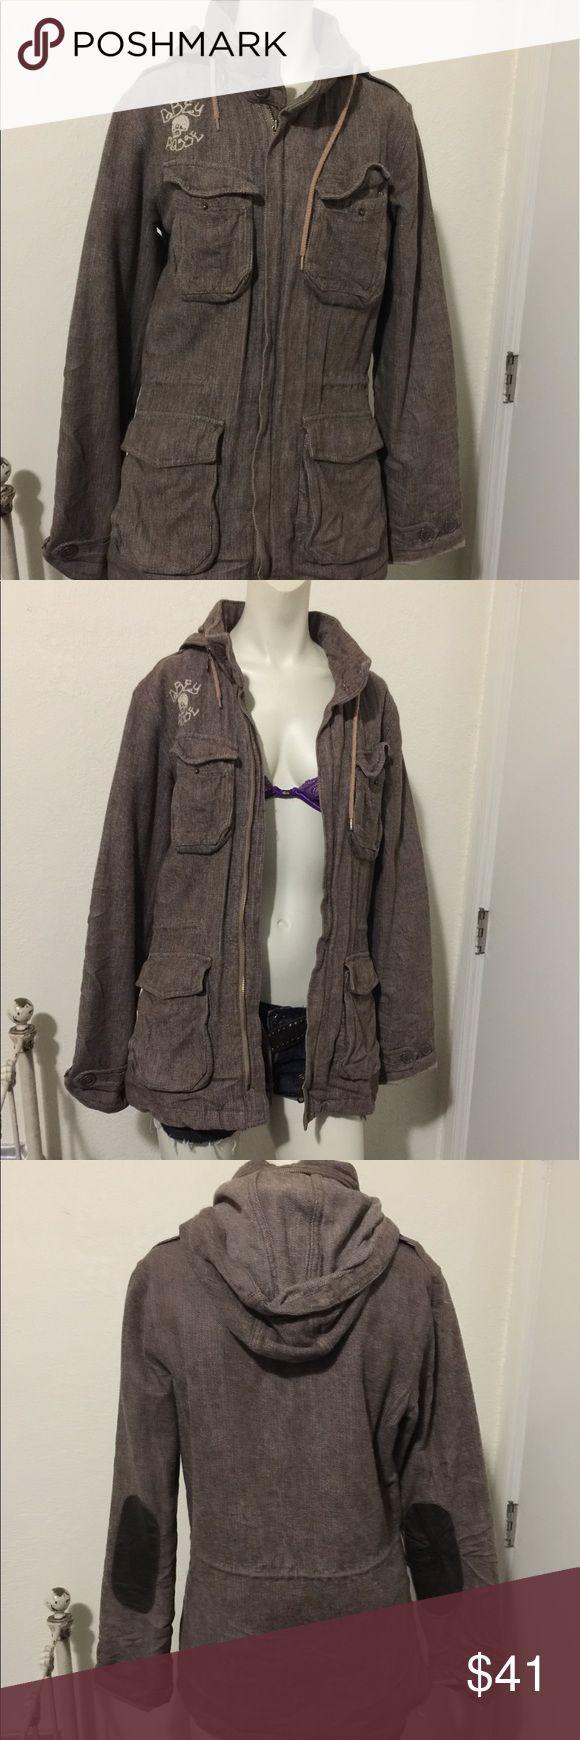 Obey/ parka style jacket Obey brand/ gently used/ size M Obey Jackets & Coats Utility Jackets